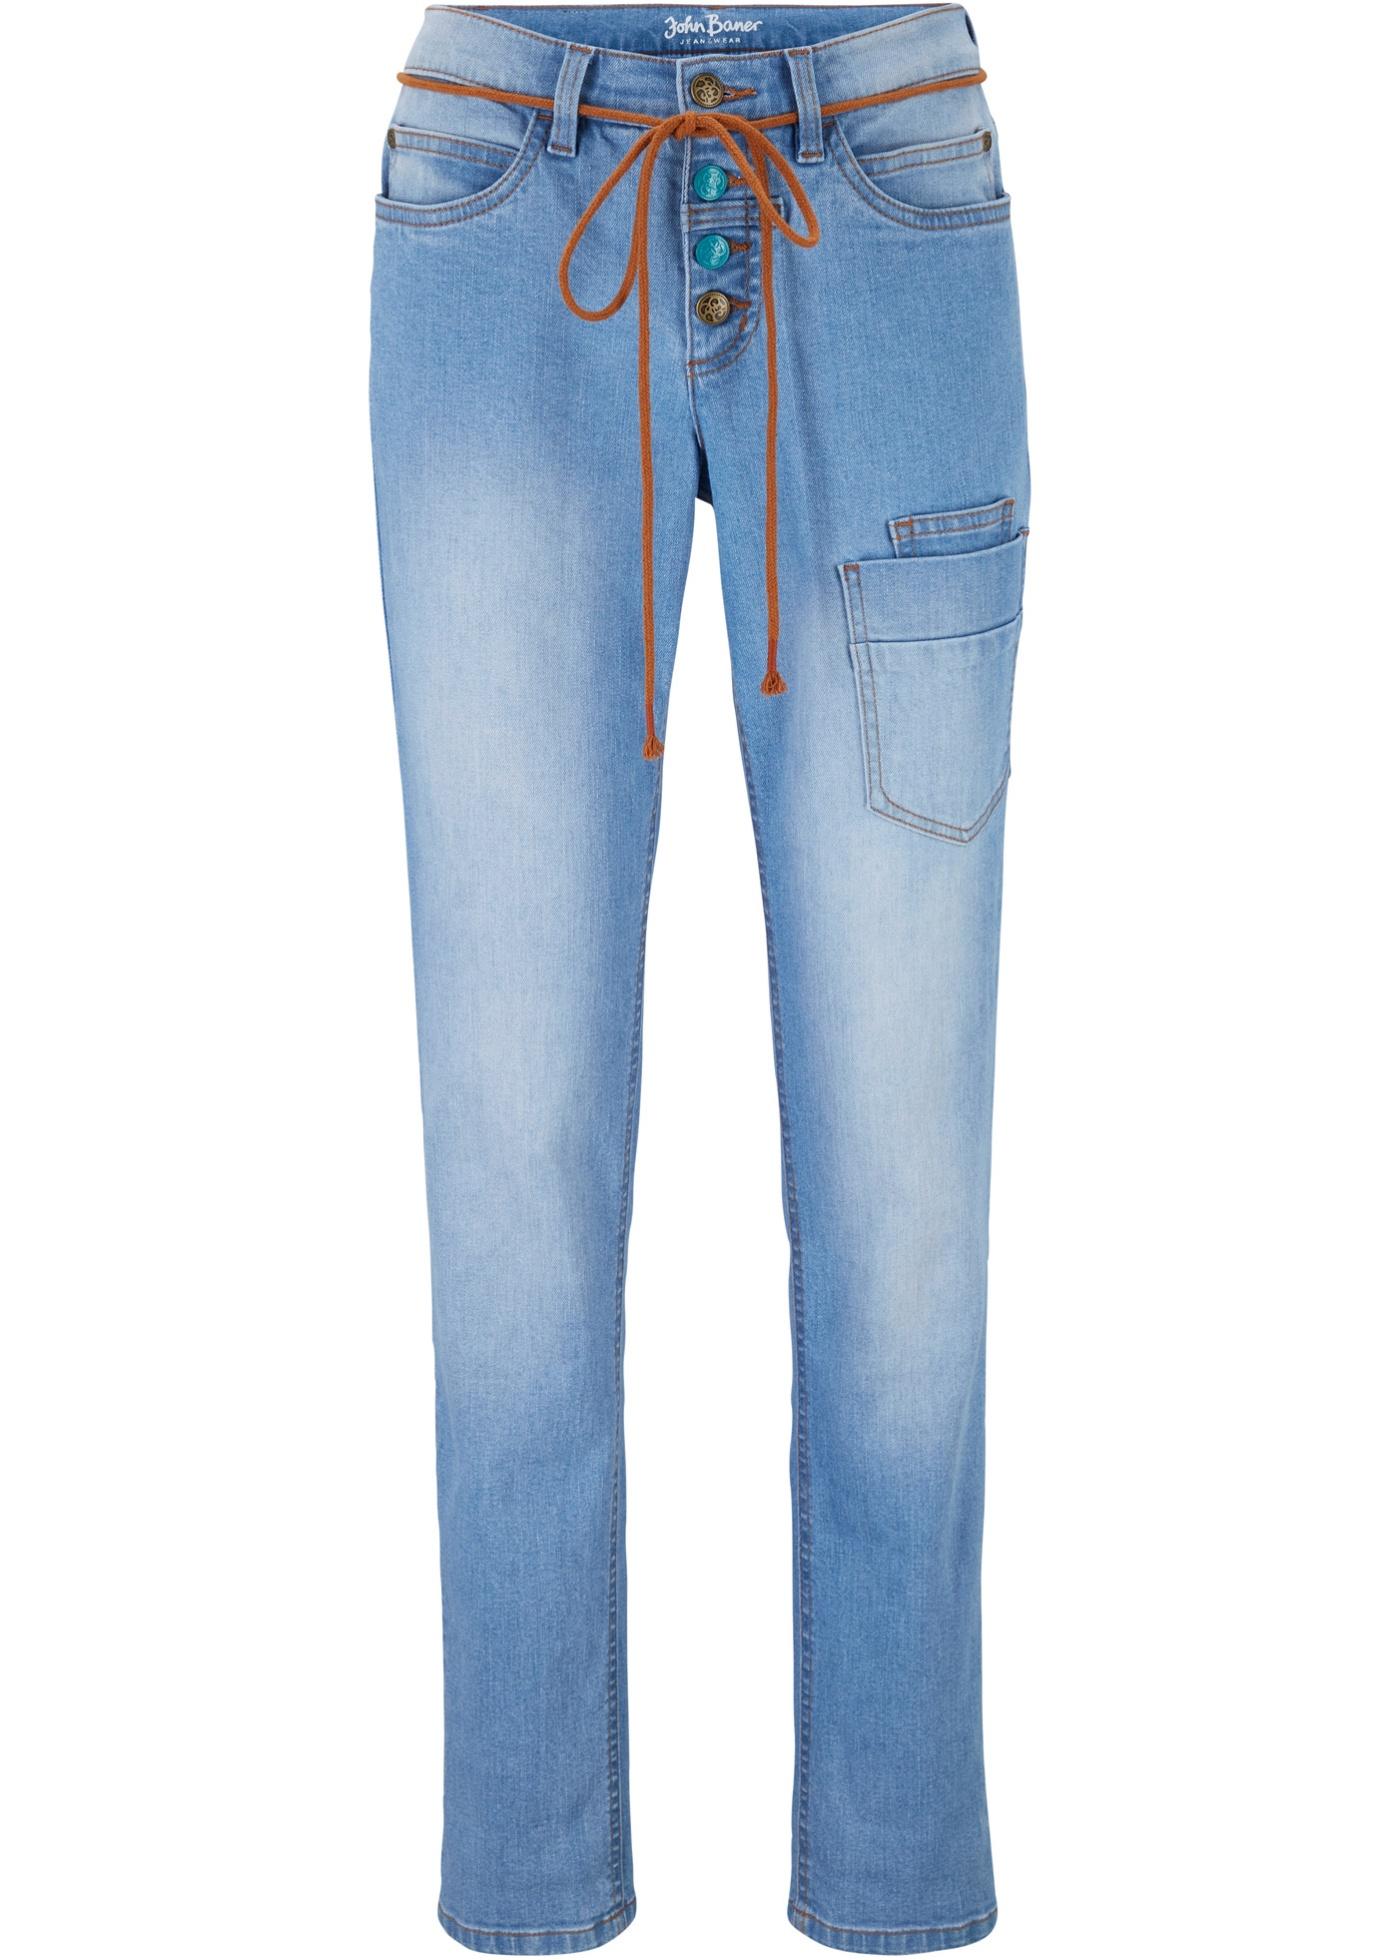 Hosen - Stretch Cargo Jeans, Straight › bonprix › blau  - Onlineshop Bonprix